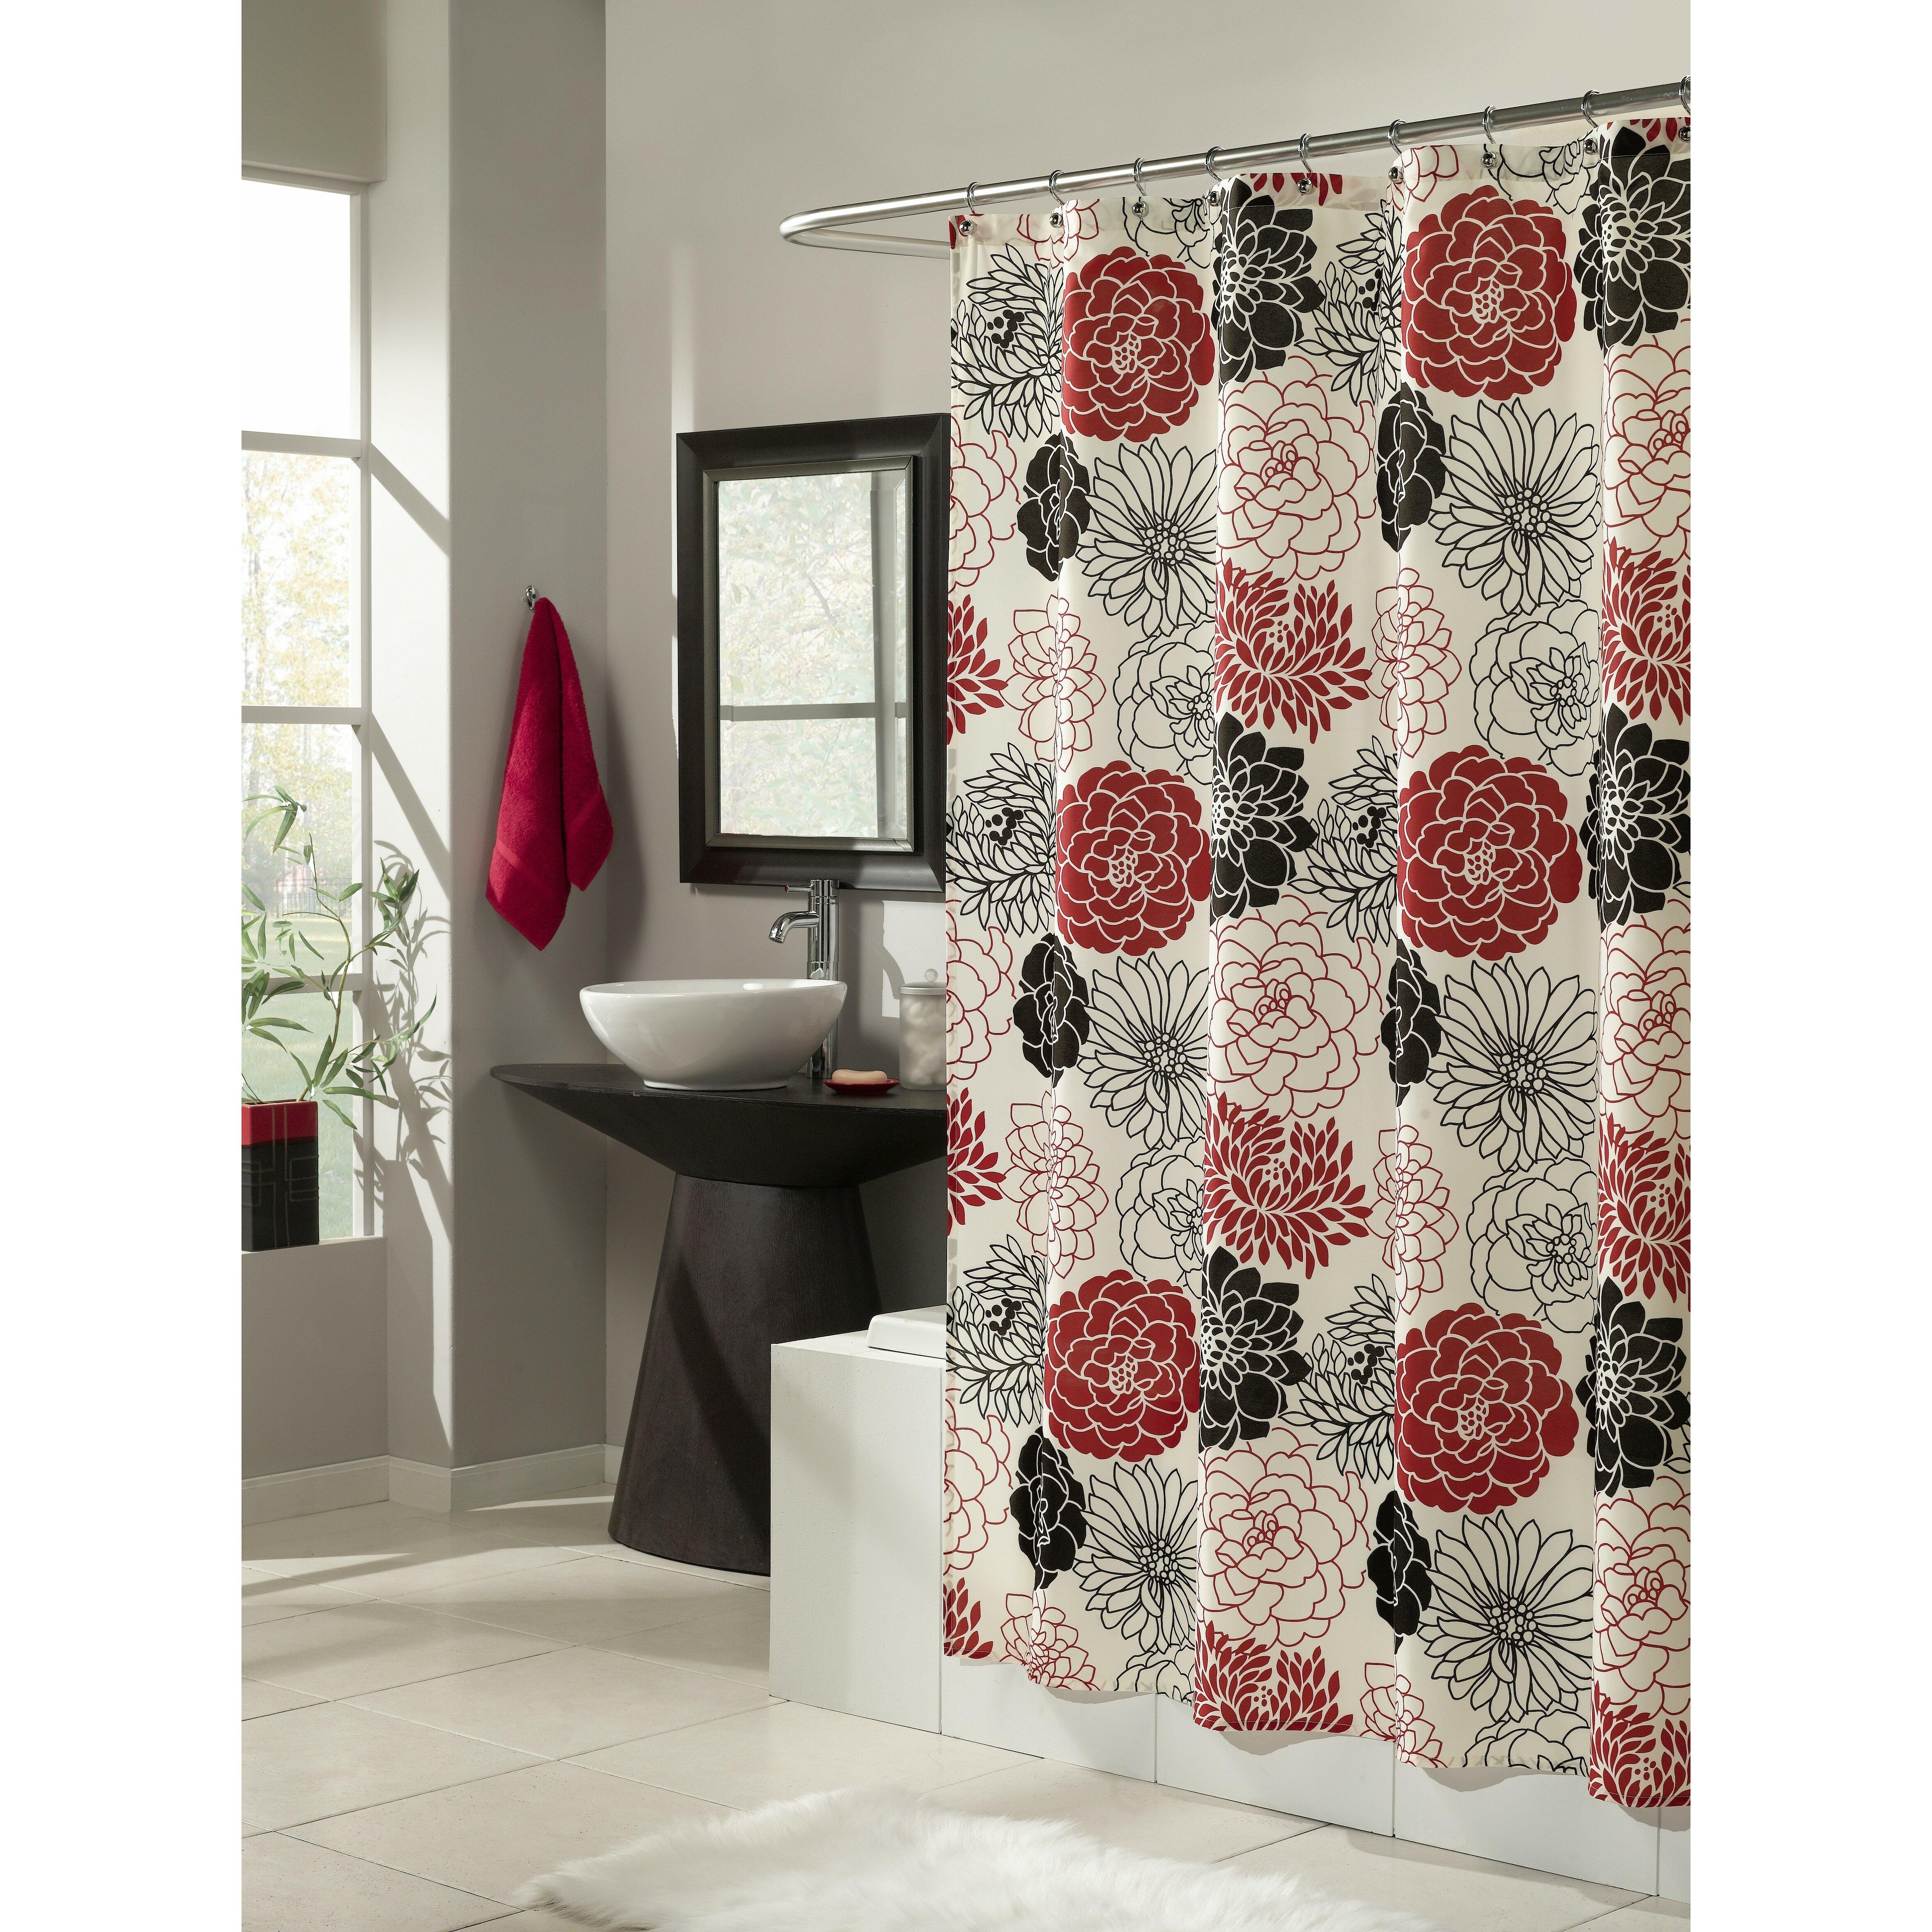 Full Bloom Microfiber Shower Curtain Reviews Wayfair